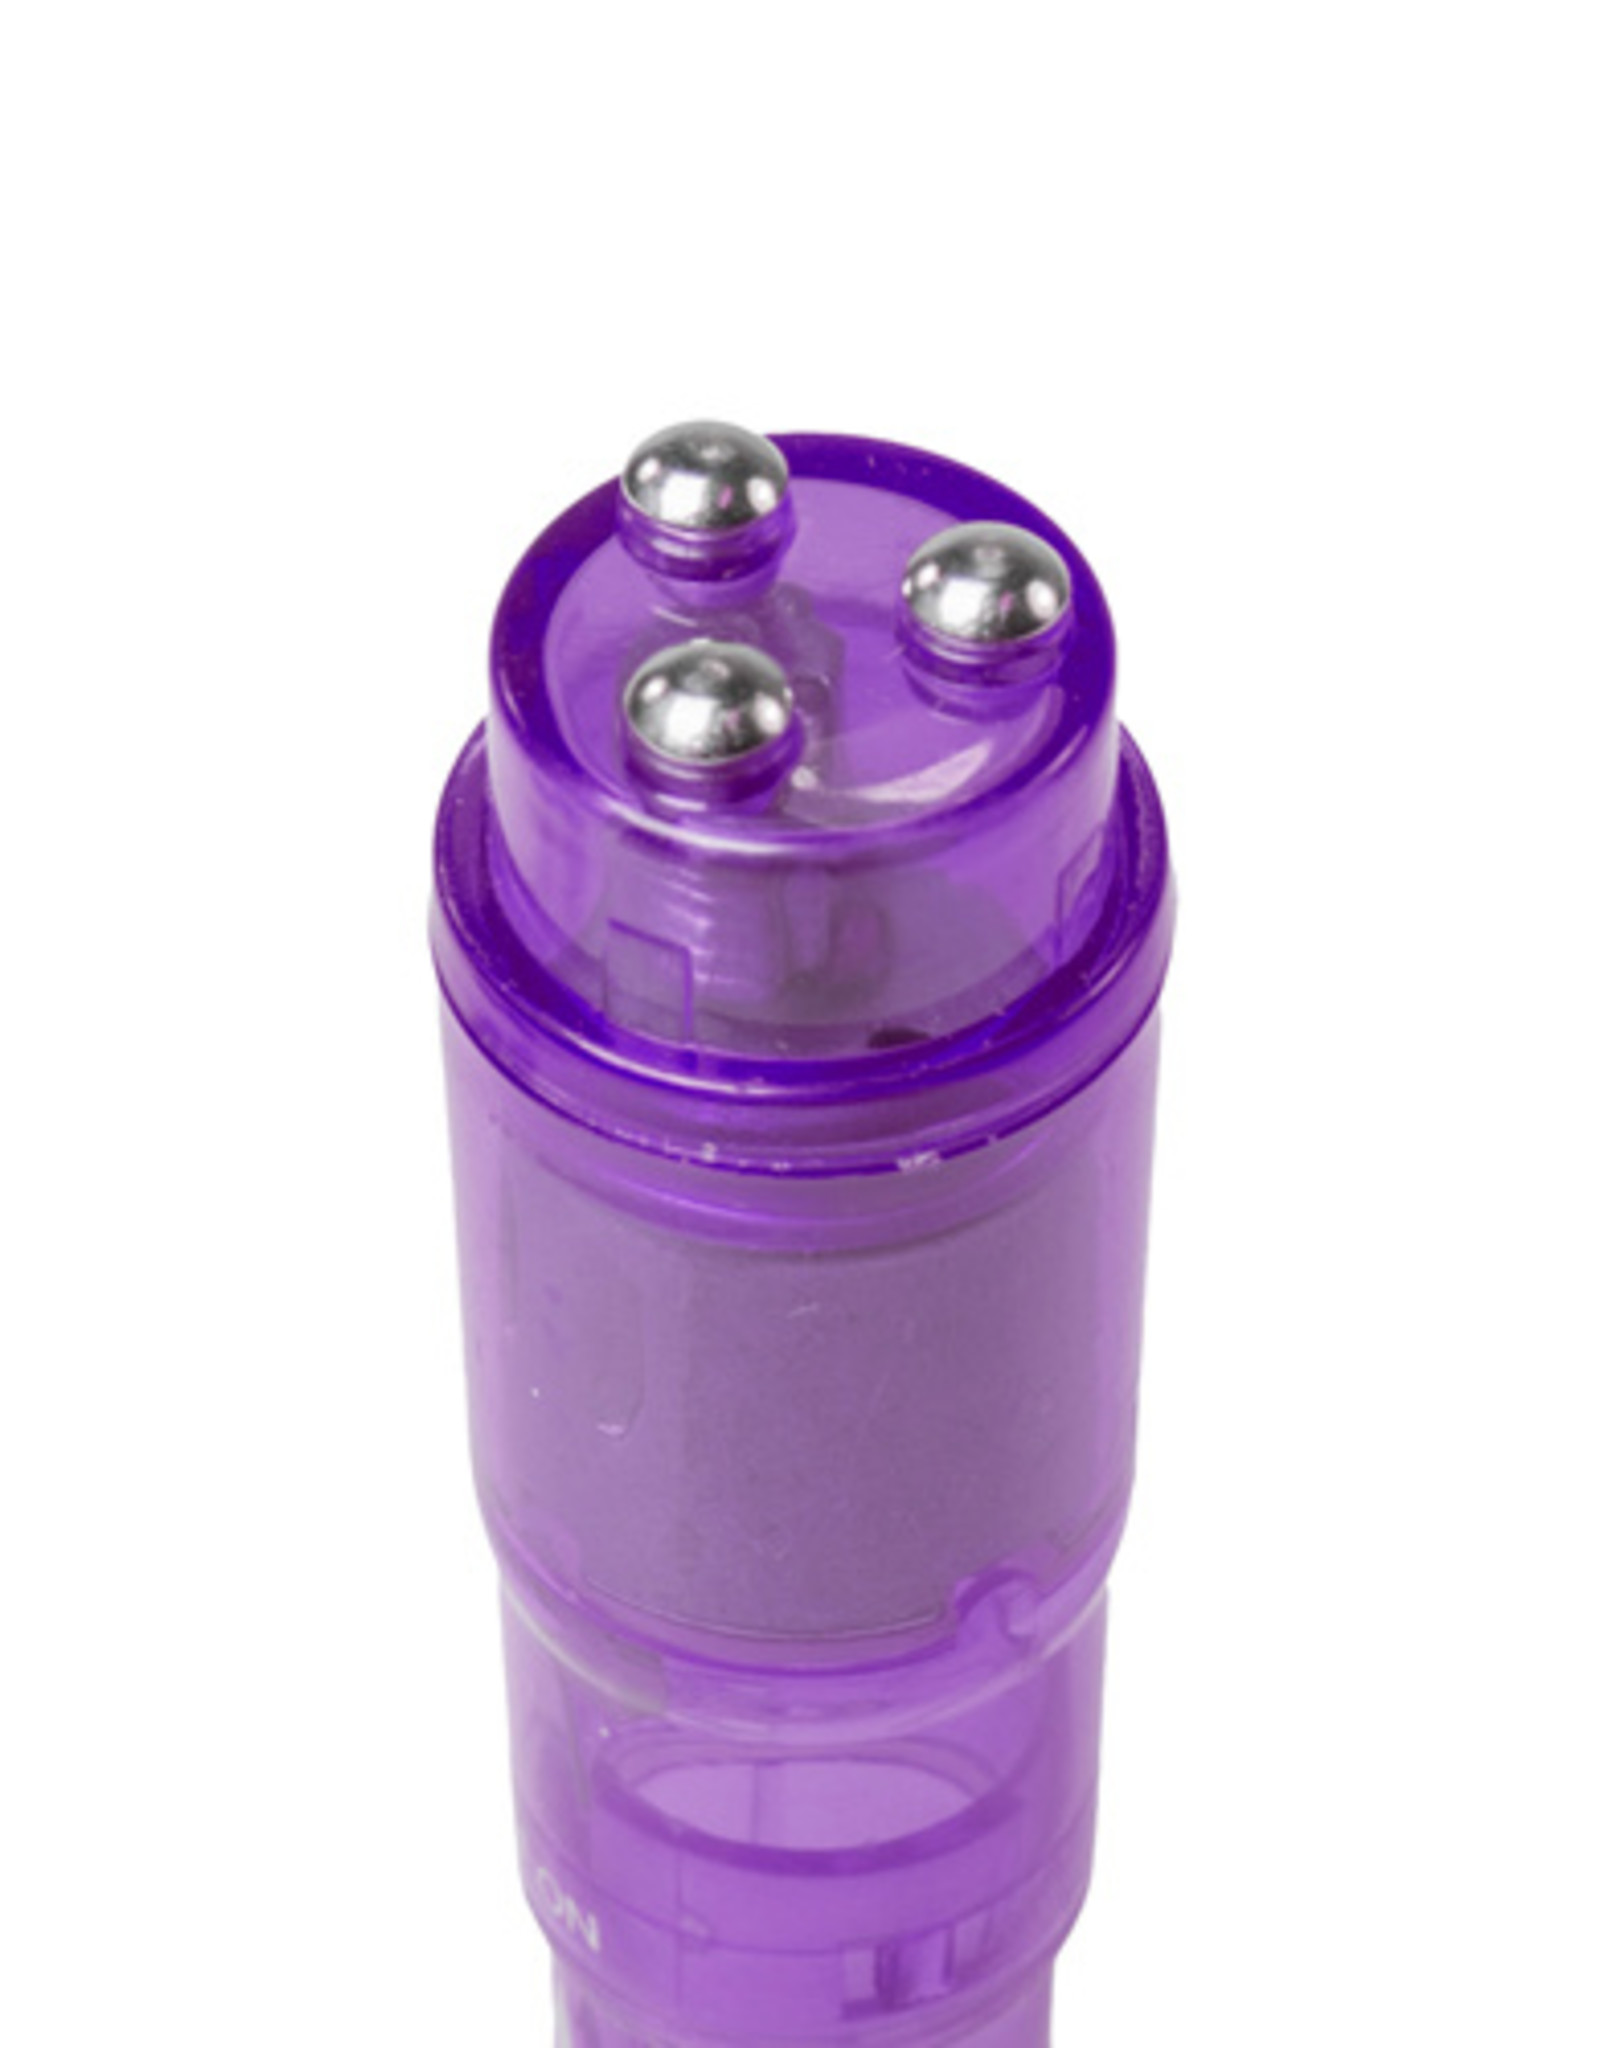 Easytoys Mini Vibe Collection Easytoys Pocket Rocket - Paars